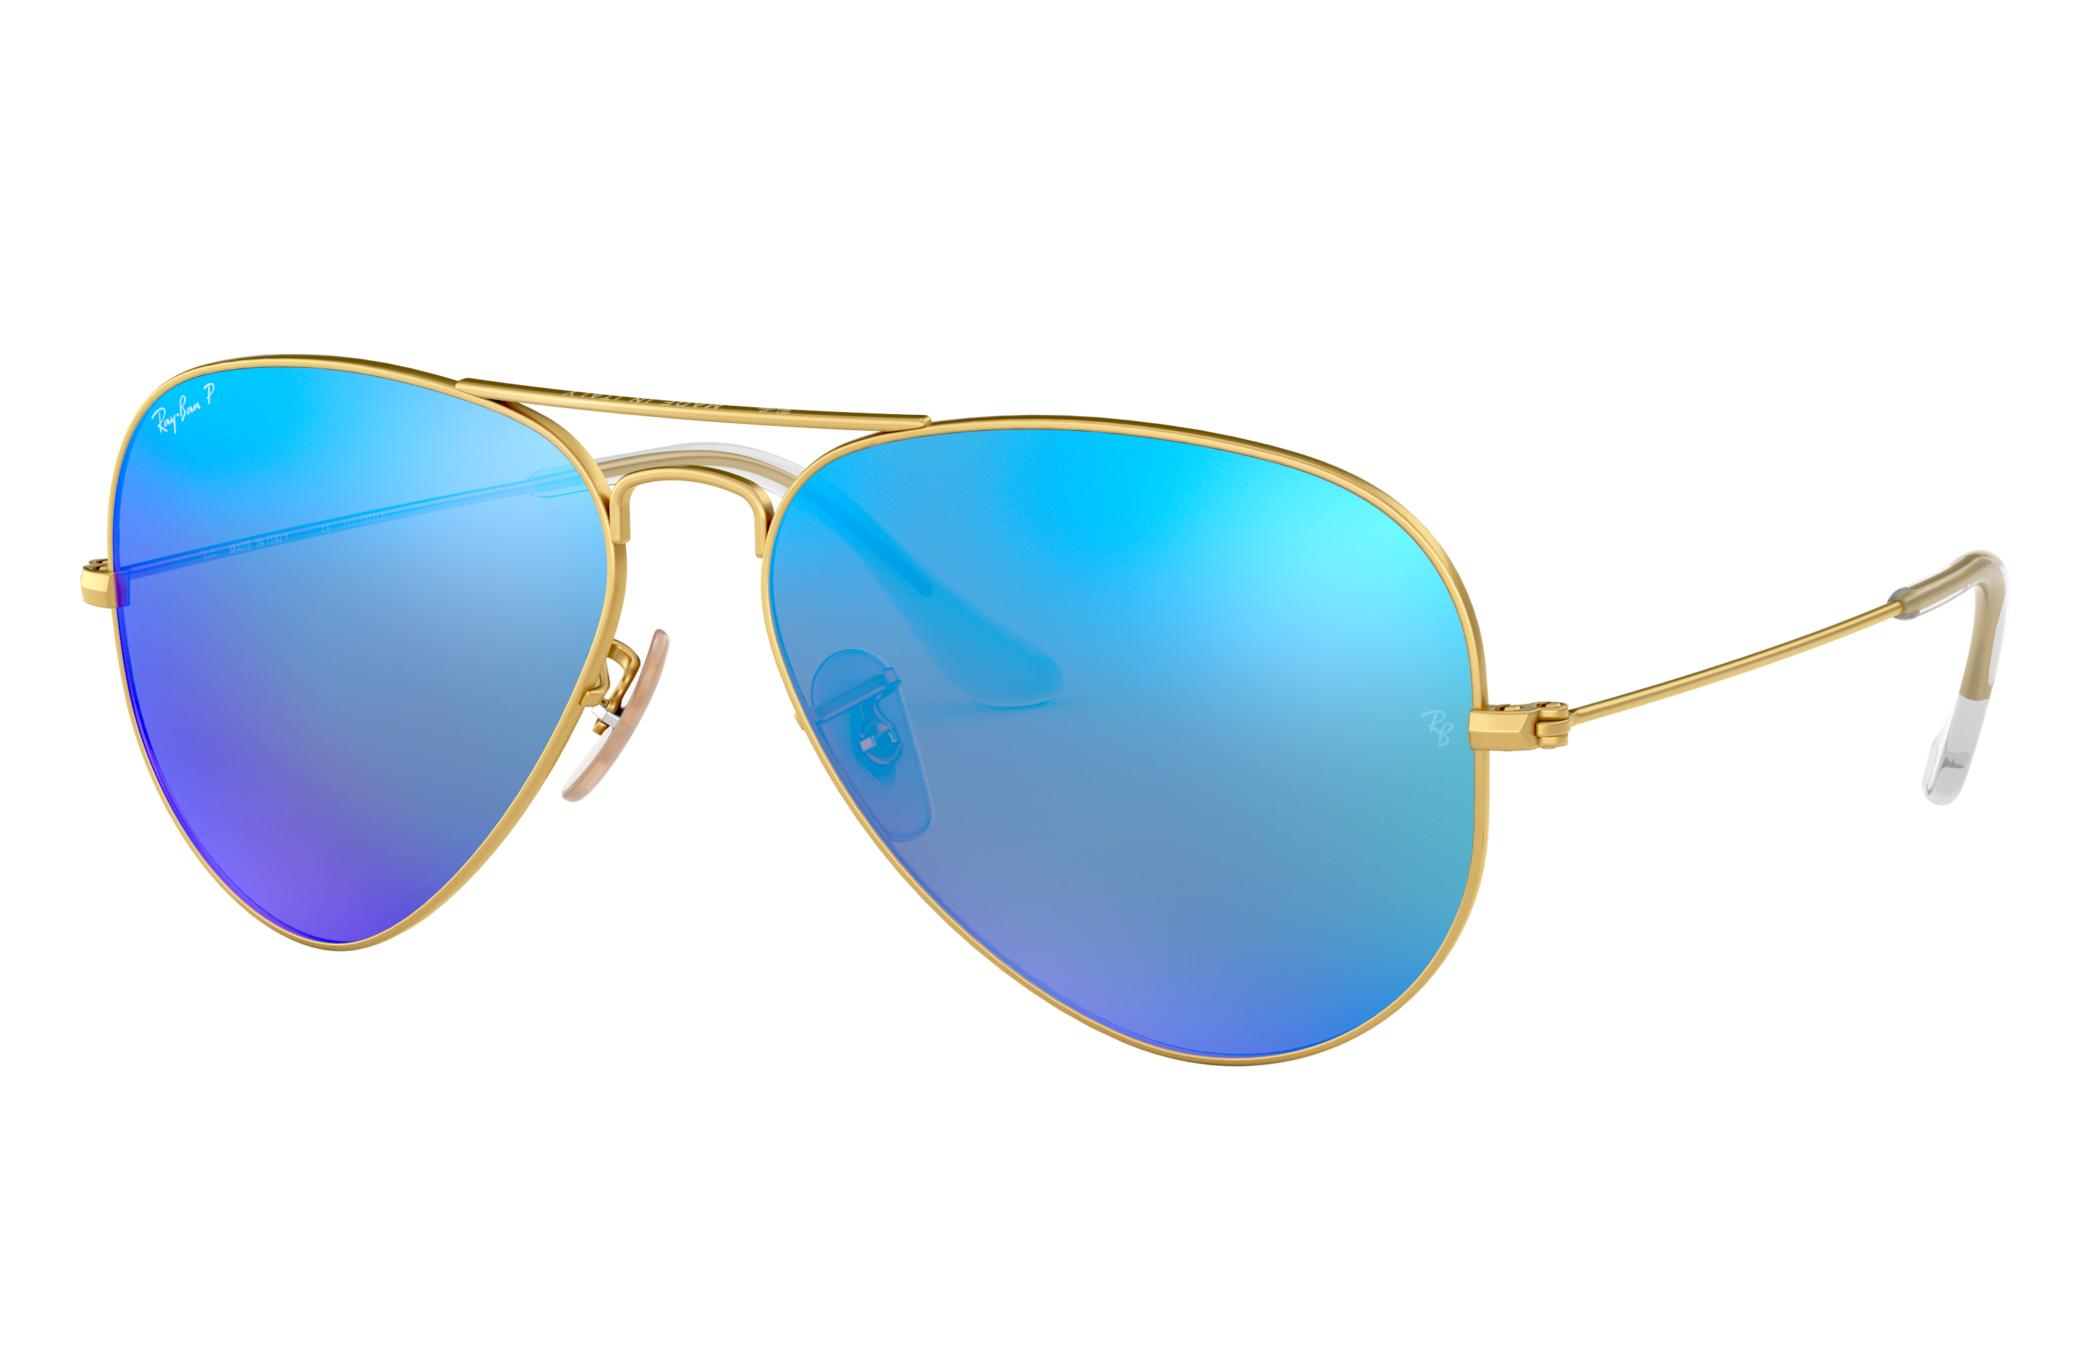 Ray-Ban Aviator Flash Lenses Gold, Polarized Blue Lenses - RB3025